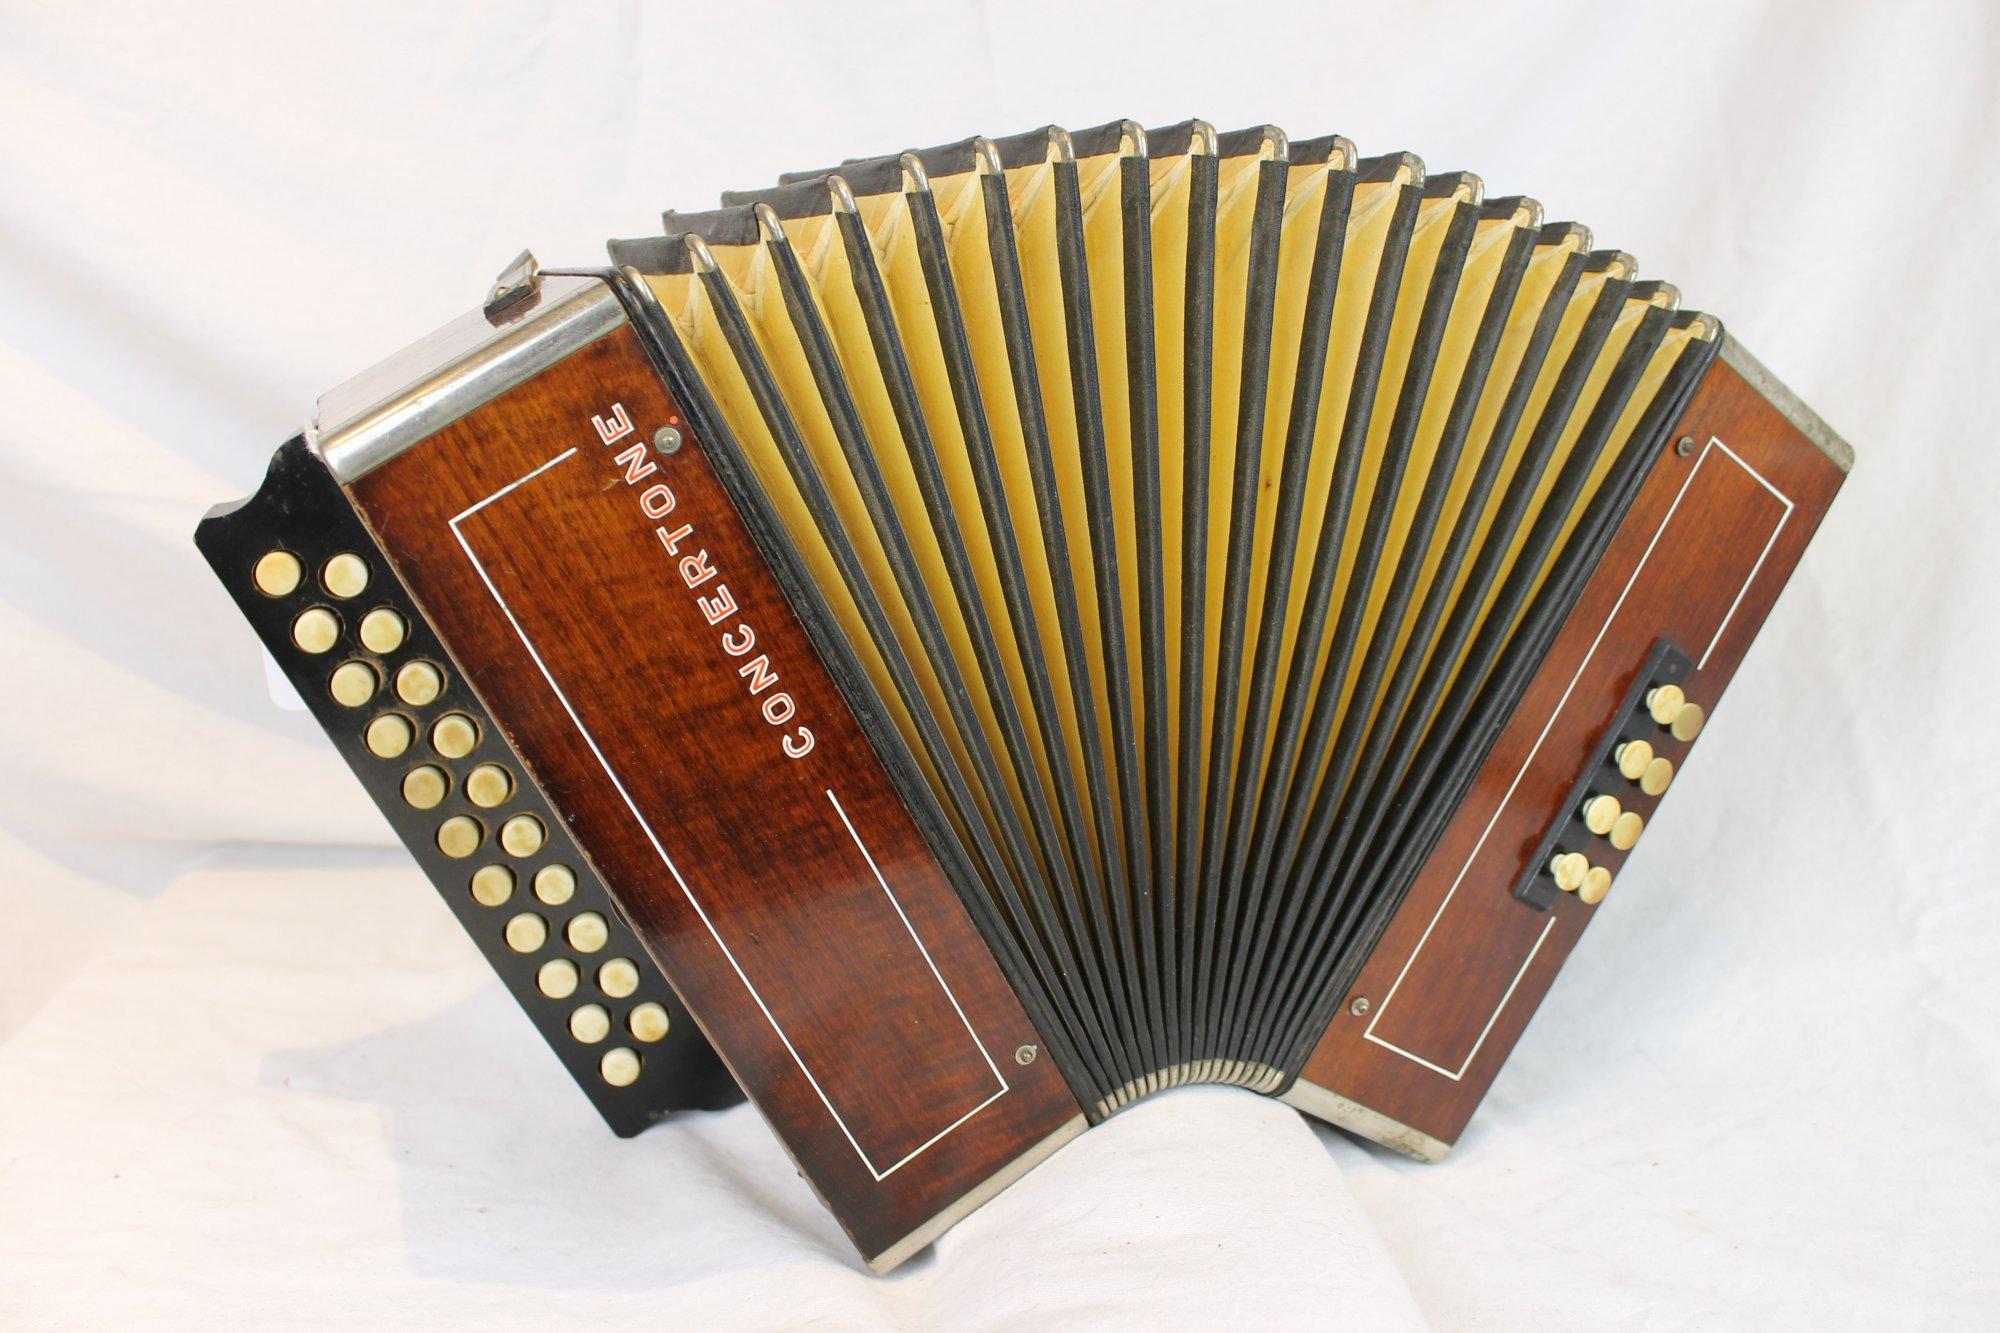 3931 - Cinnamon Hohner Concertone Diatonic Button Accordion GC MM 21 8